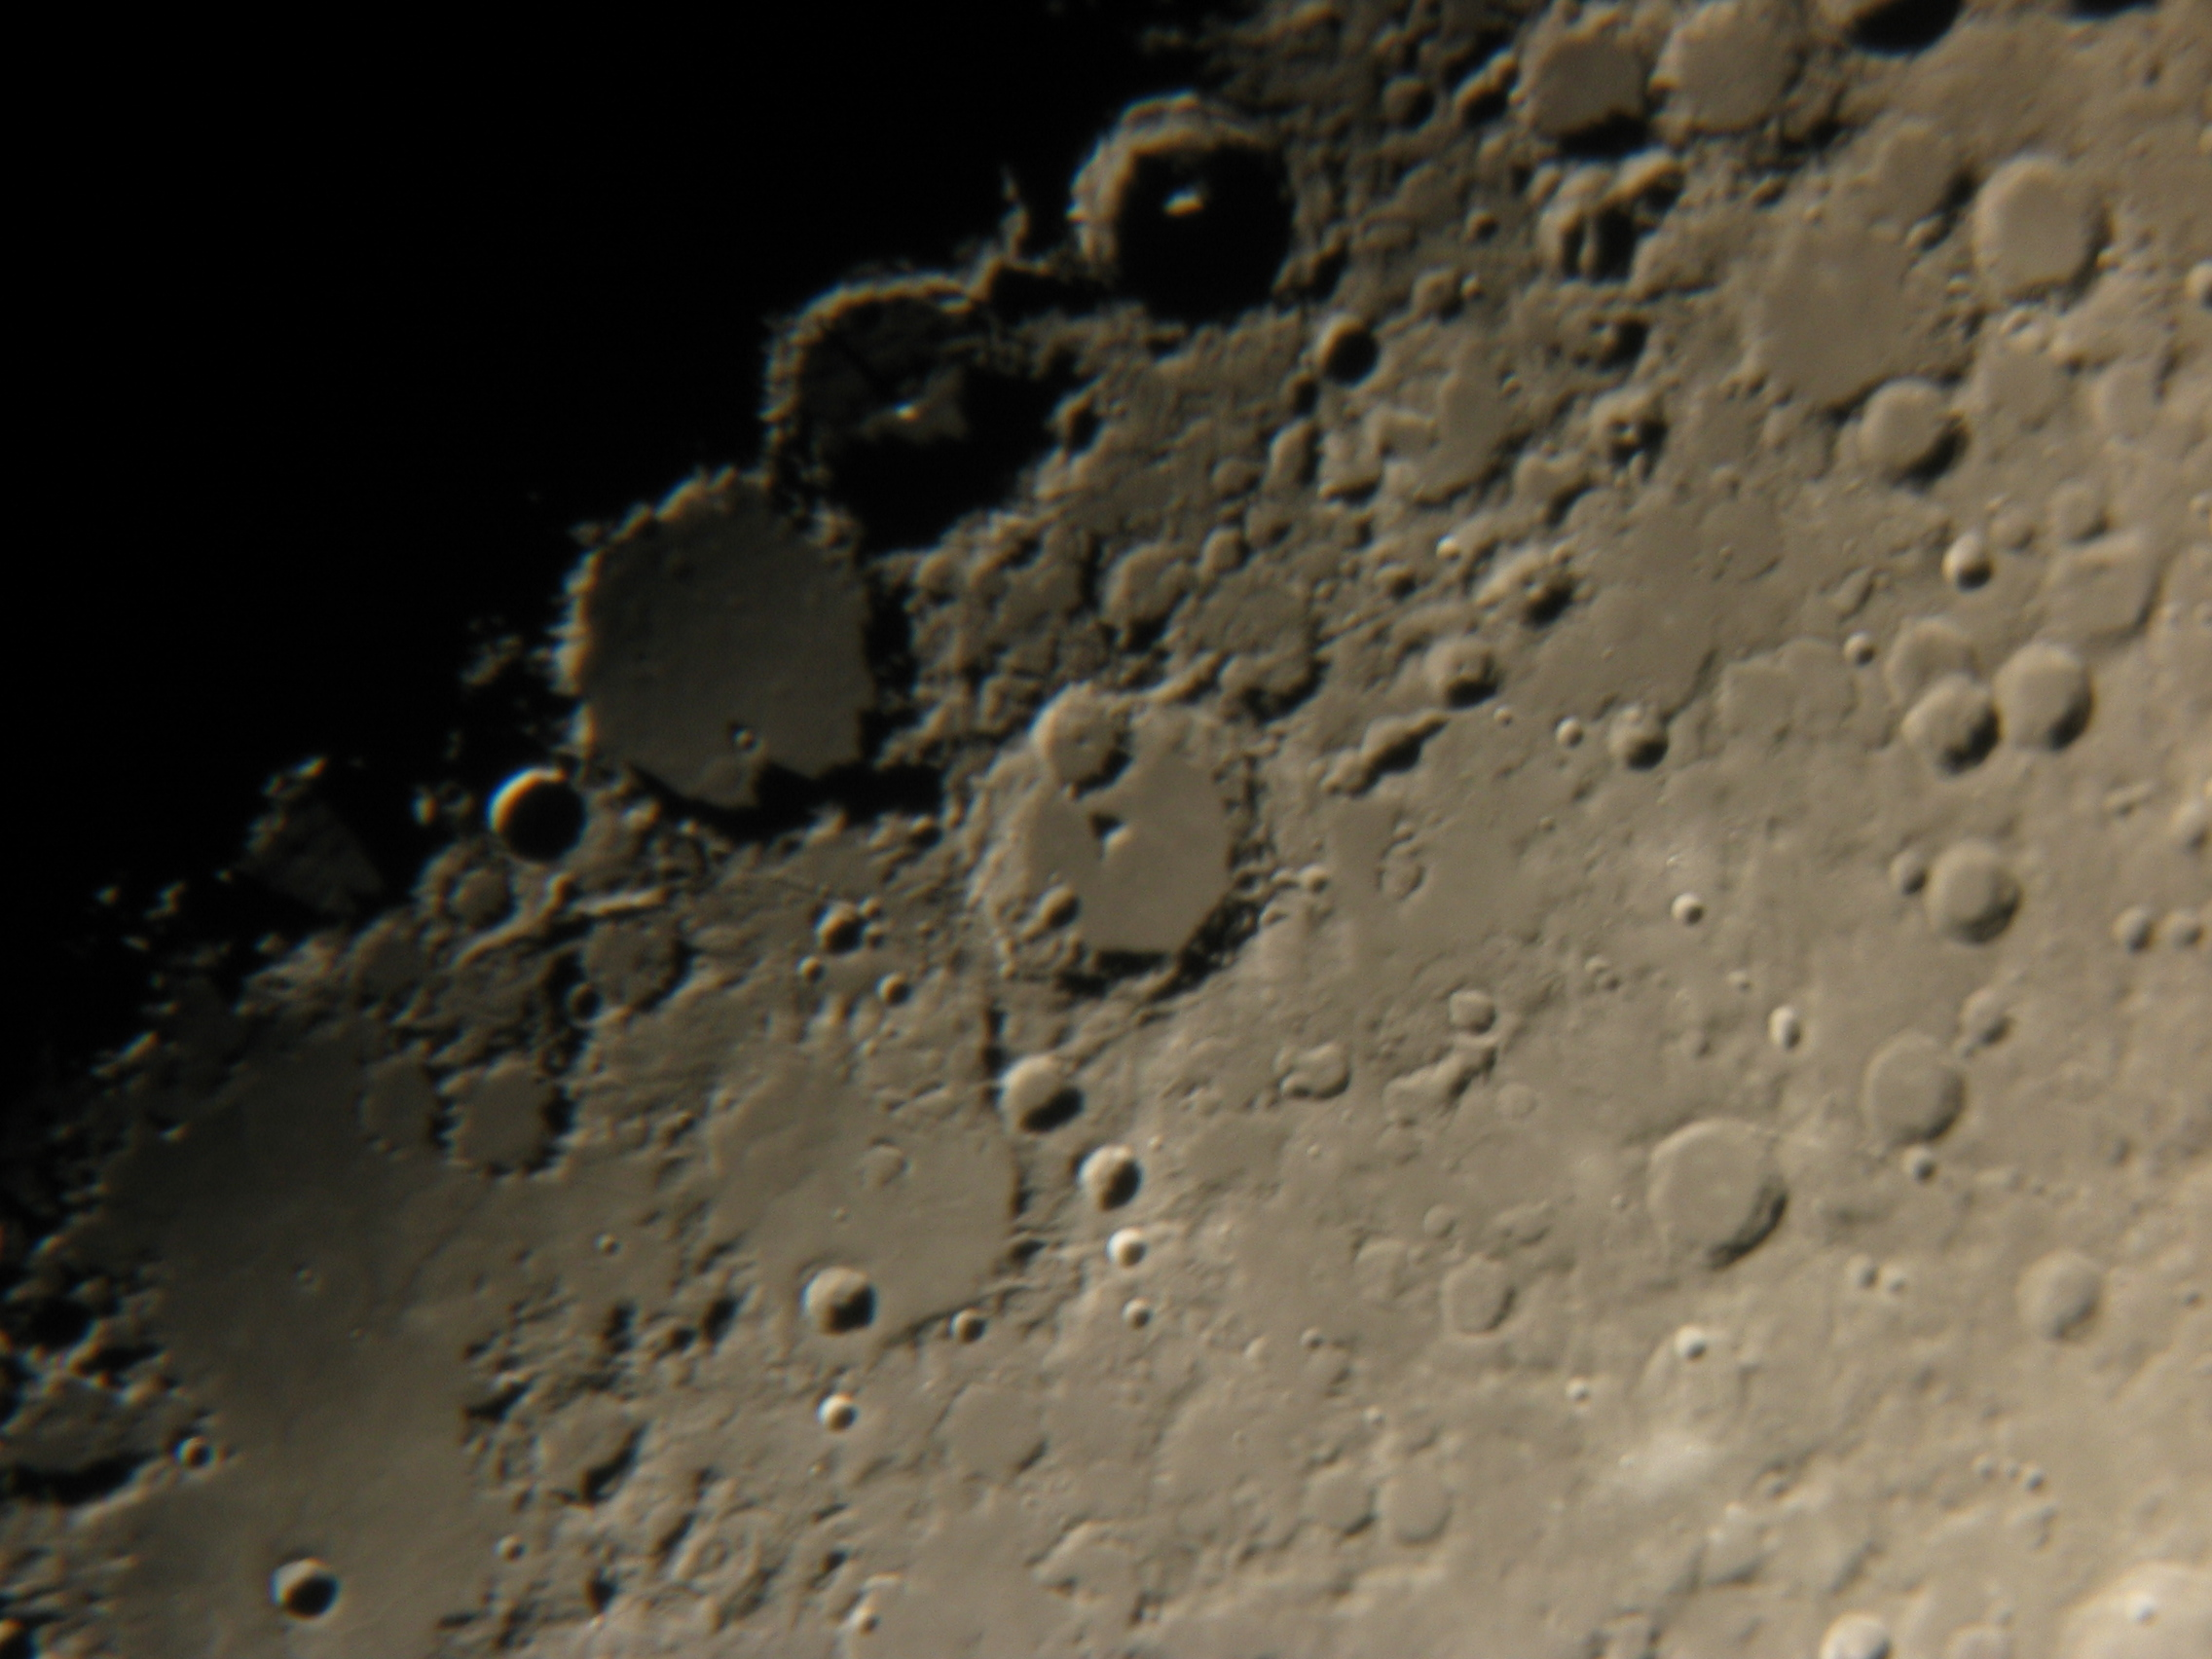 Image Details    Date:  March 28, 2004  Author:  Tim Doucette  Telescope:  C9.25  Mount:  Celestron AS-GT  Camera:  Canon Powershot S45  Site:  Moncton  Exposure:  1/13 sec  Effective Focal Length:  21.3 mm  Effective Focal Ratio:  f/4.9     Description   Taken through the eyepiece (15mm I think) of my C9.25